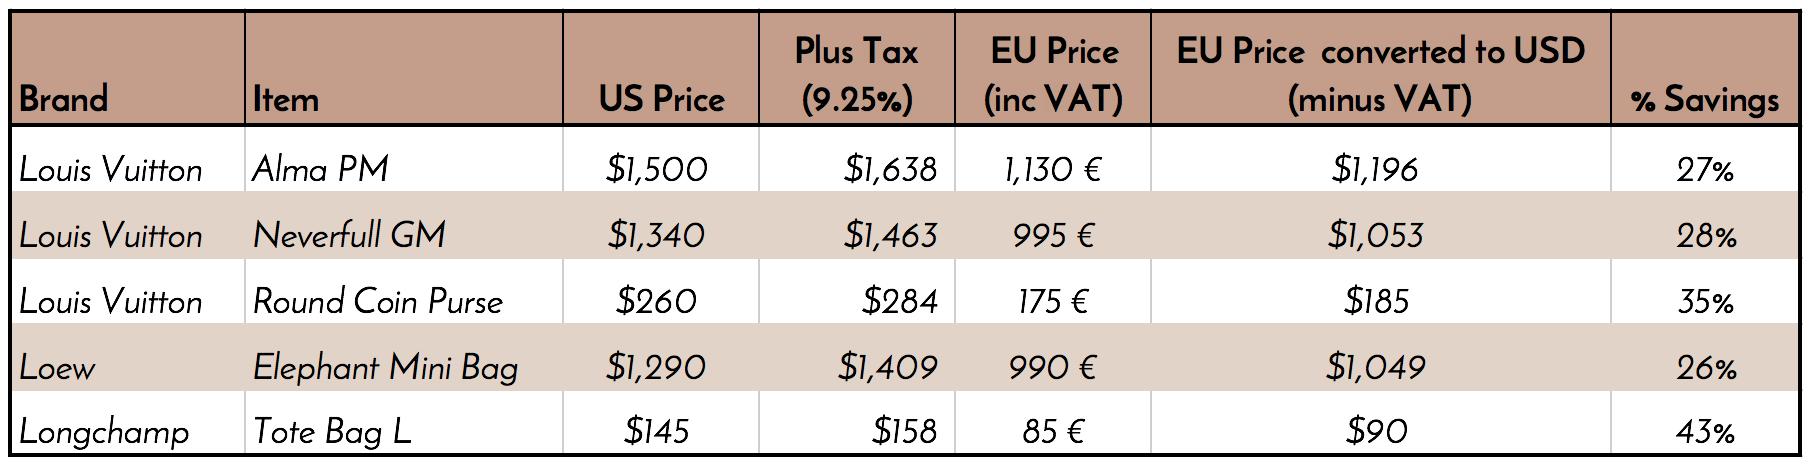 european handbag prices vs. U.S. prices